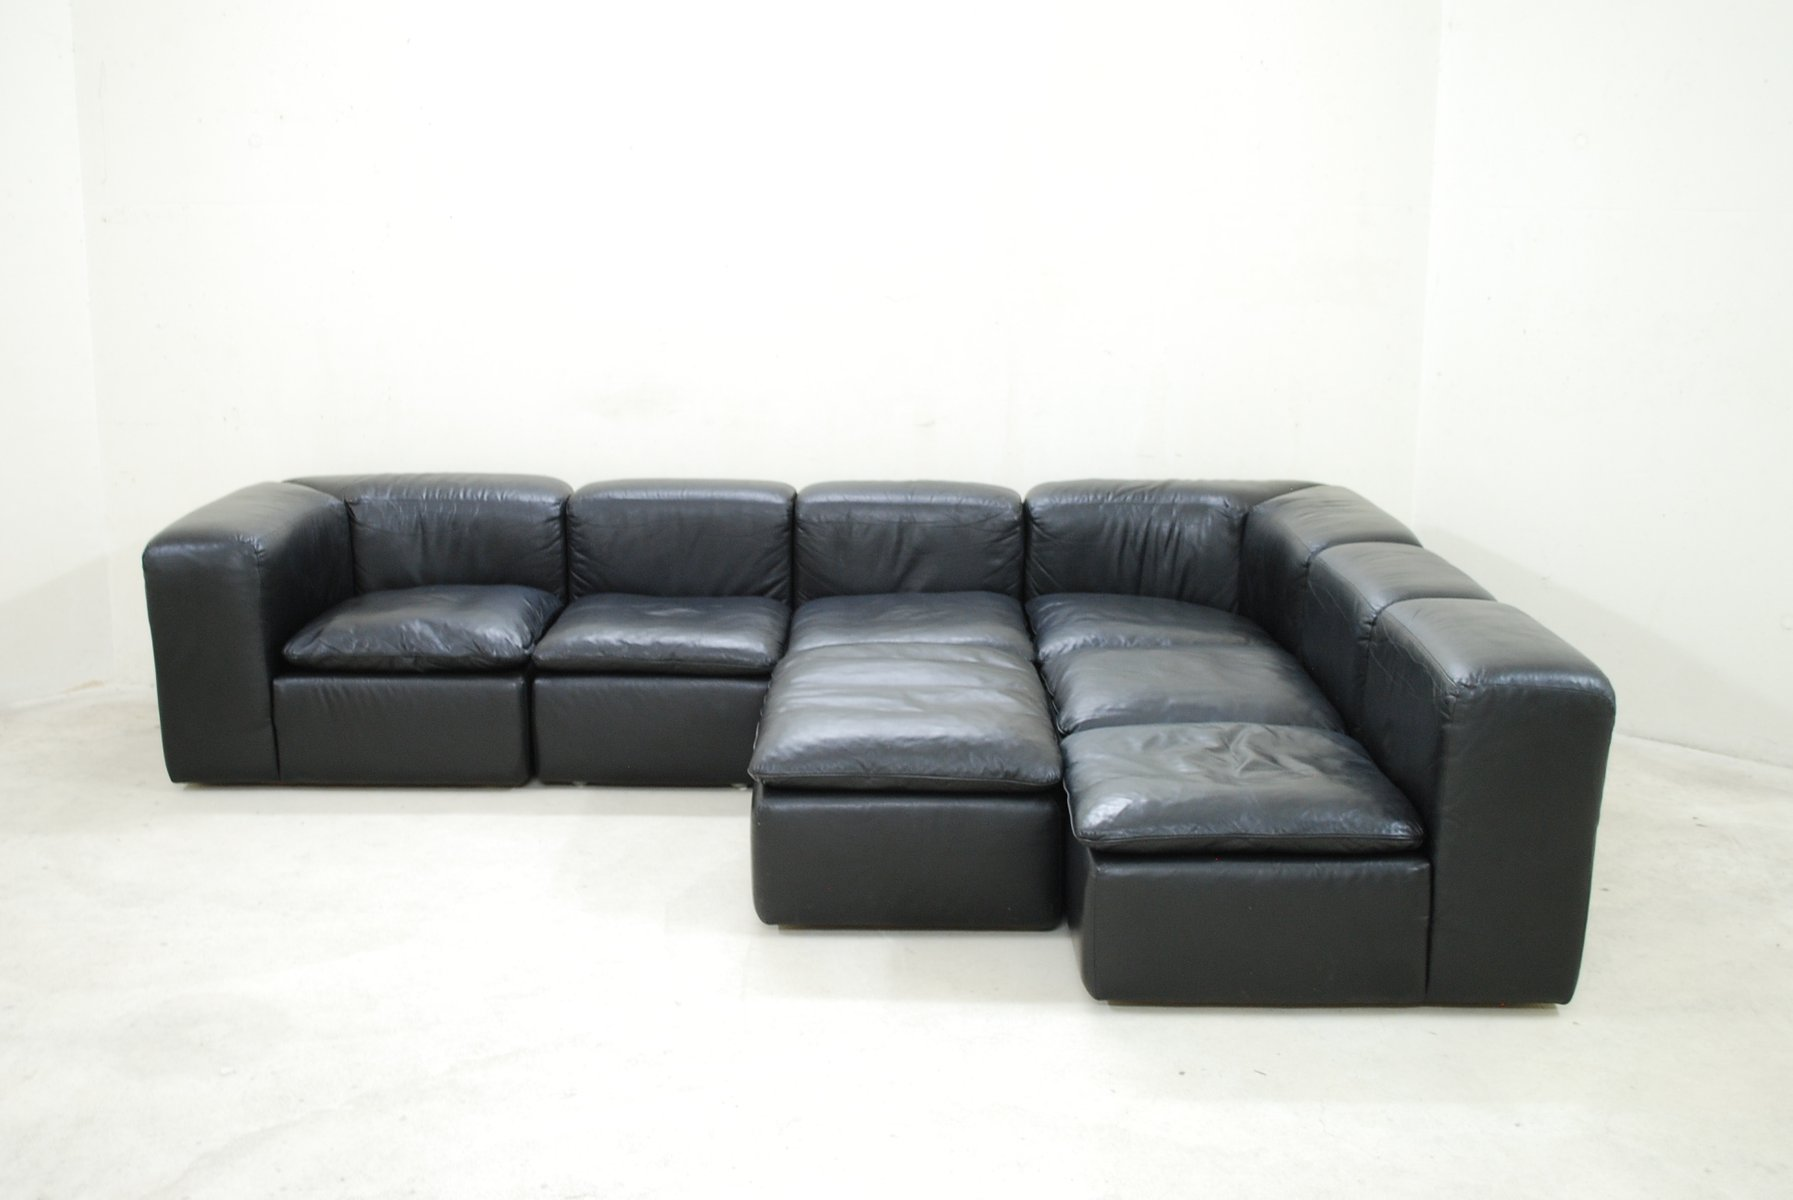 schwarzes modulares cube design wk 550 ledersofa von ernst martin dettinger f r wk m bel bei. Black Bedroom Furniture Sets. Home Design Ideas